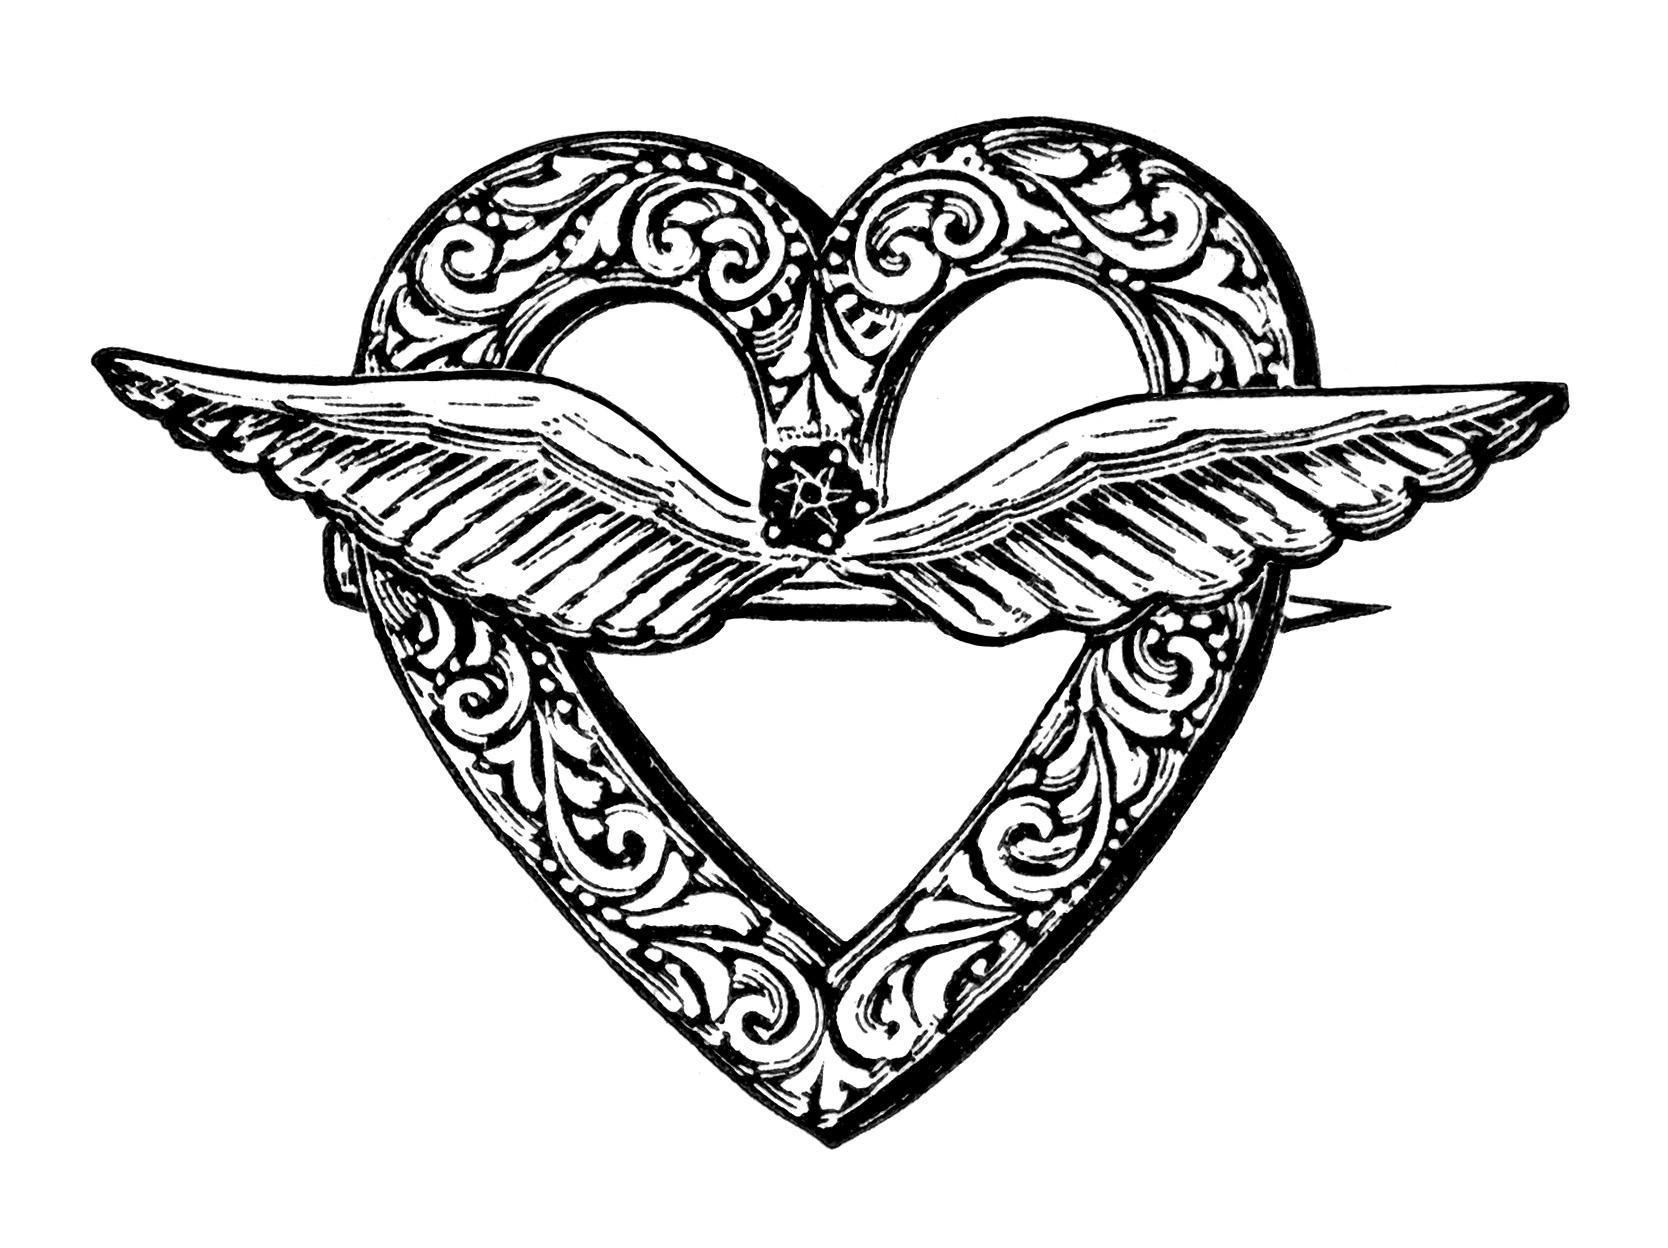 Wings clipart vintage Vintage Art Clipart Vintage Heart